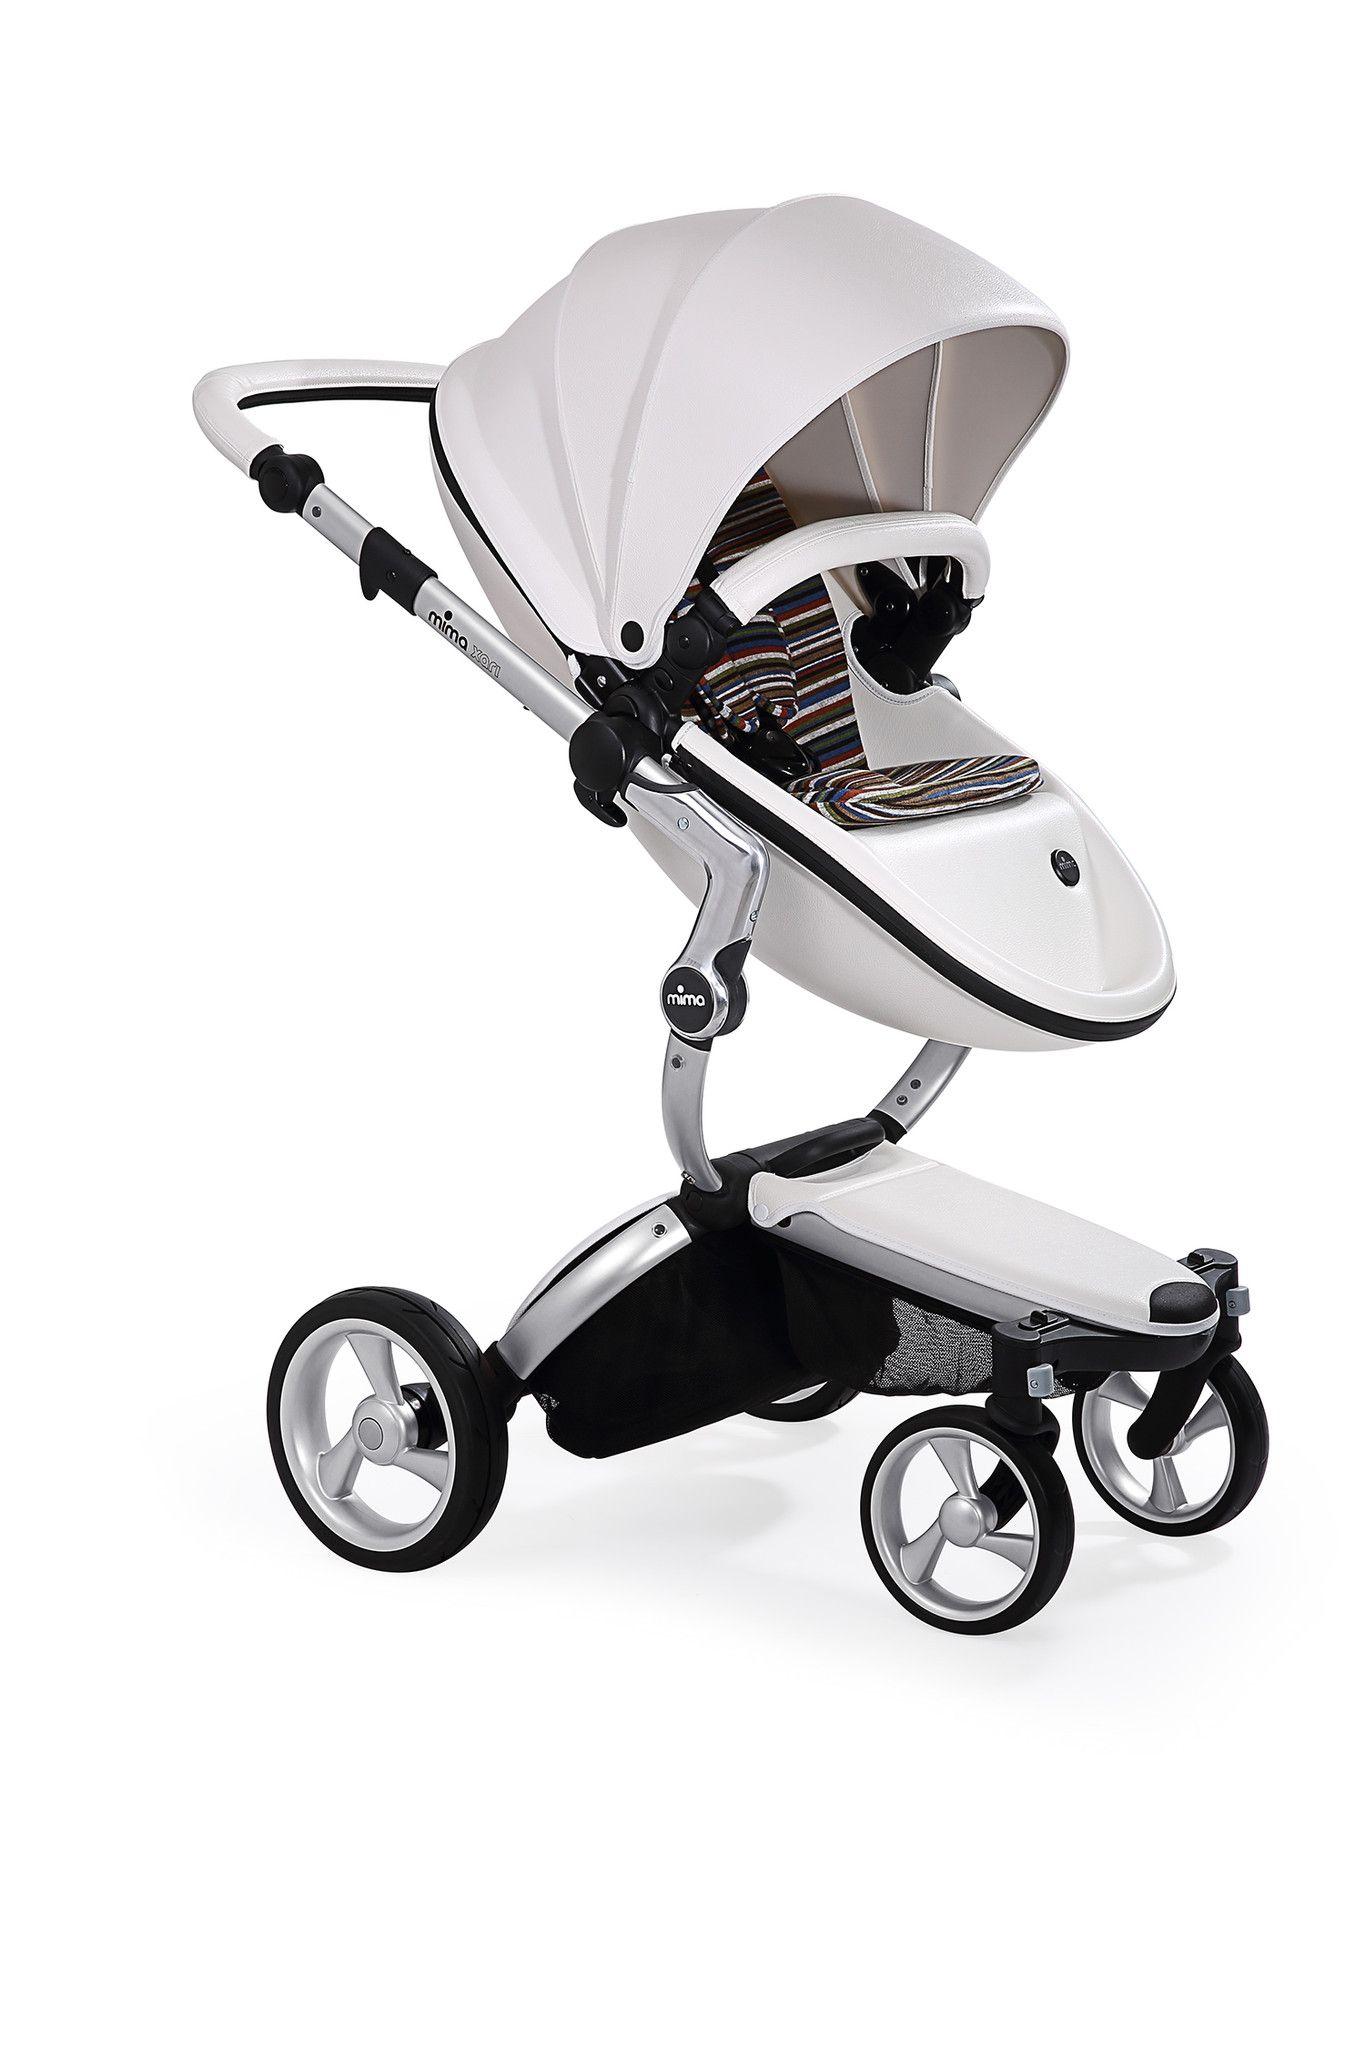 Mima Xari Stroller Silver Frame Baby Stroller Baby